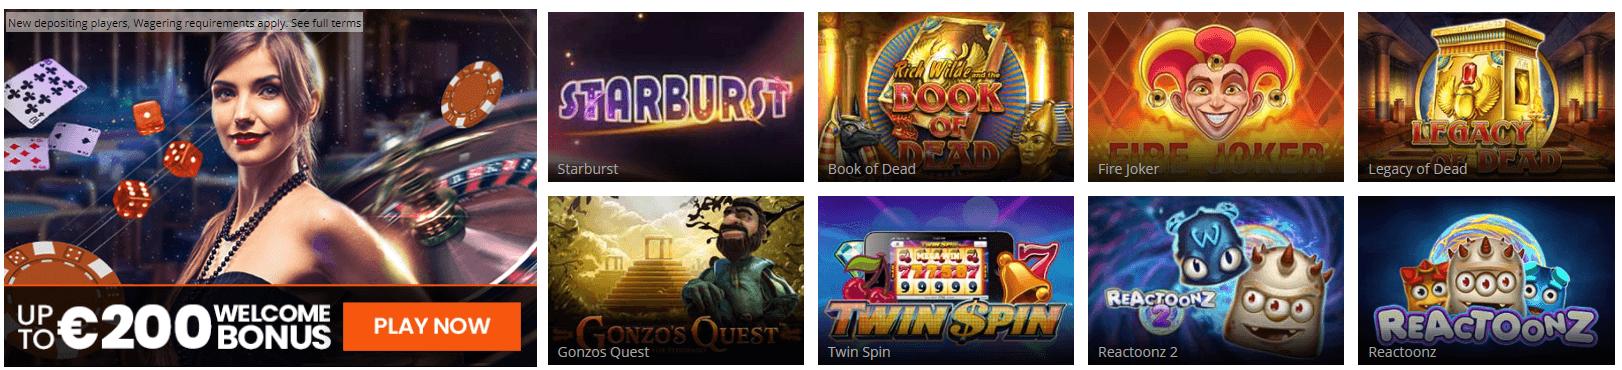 mrmega casino games